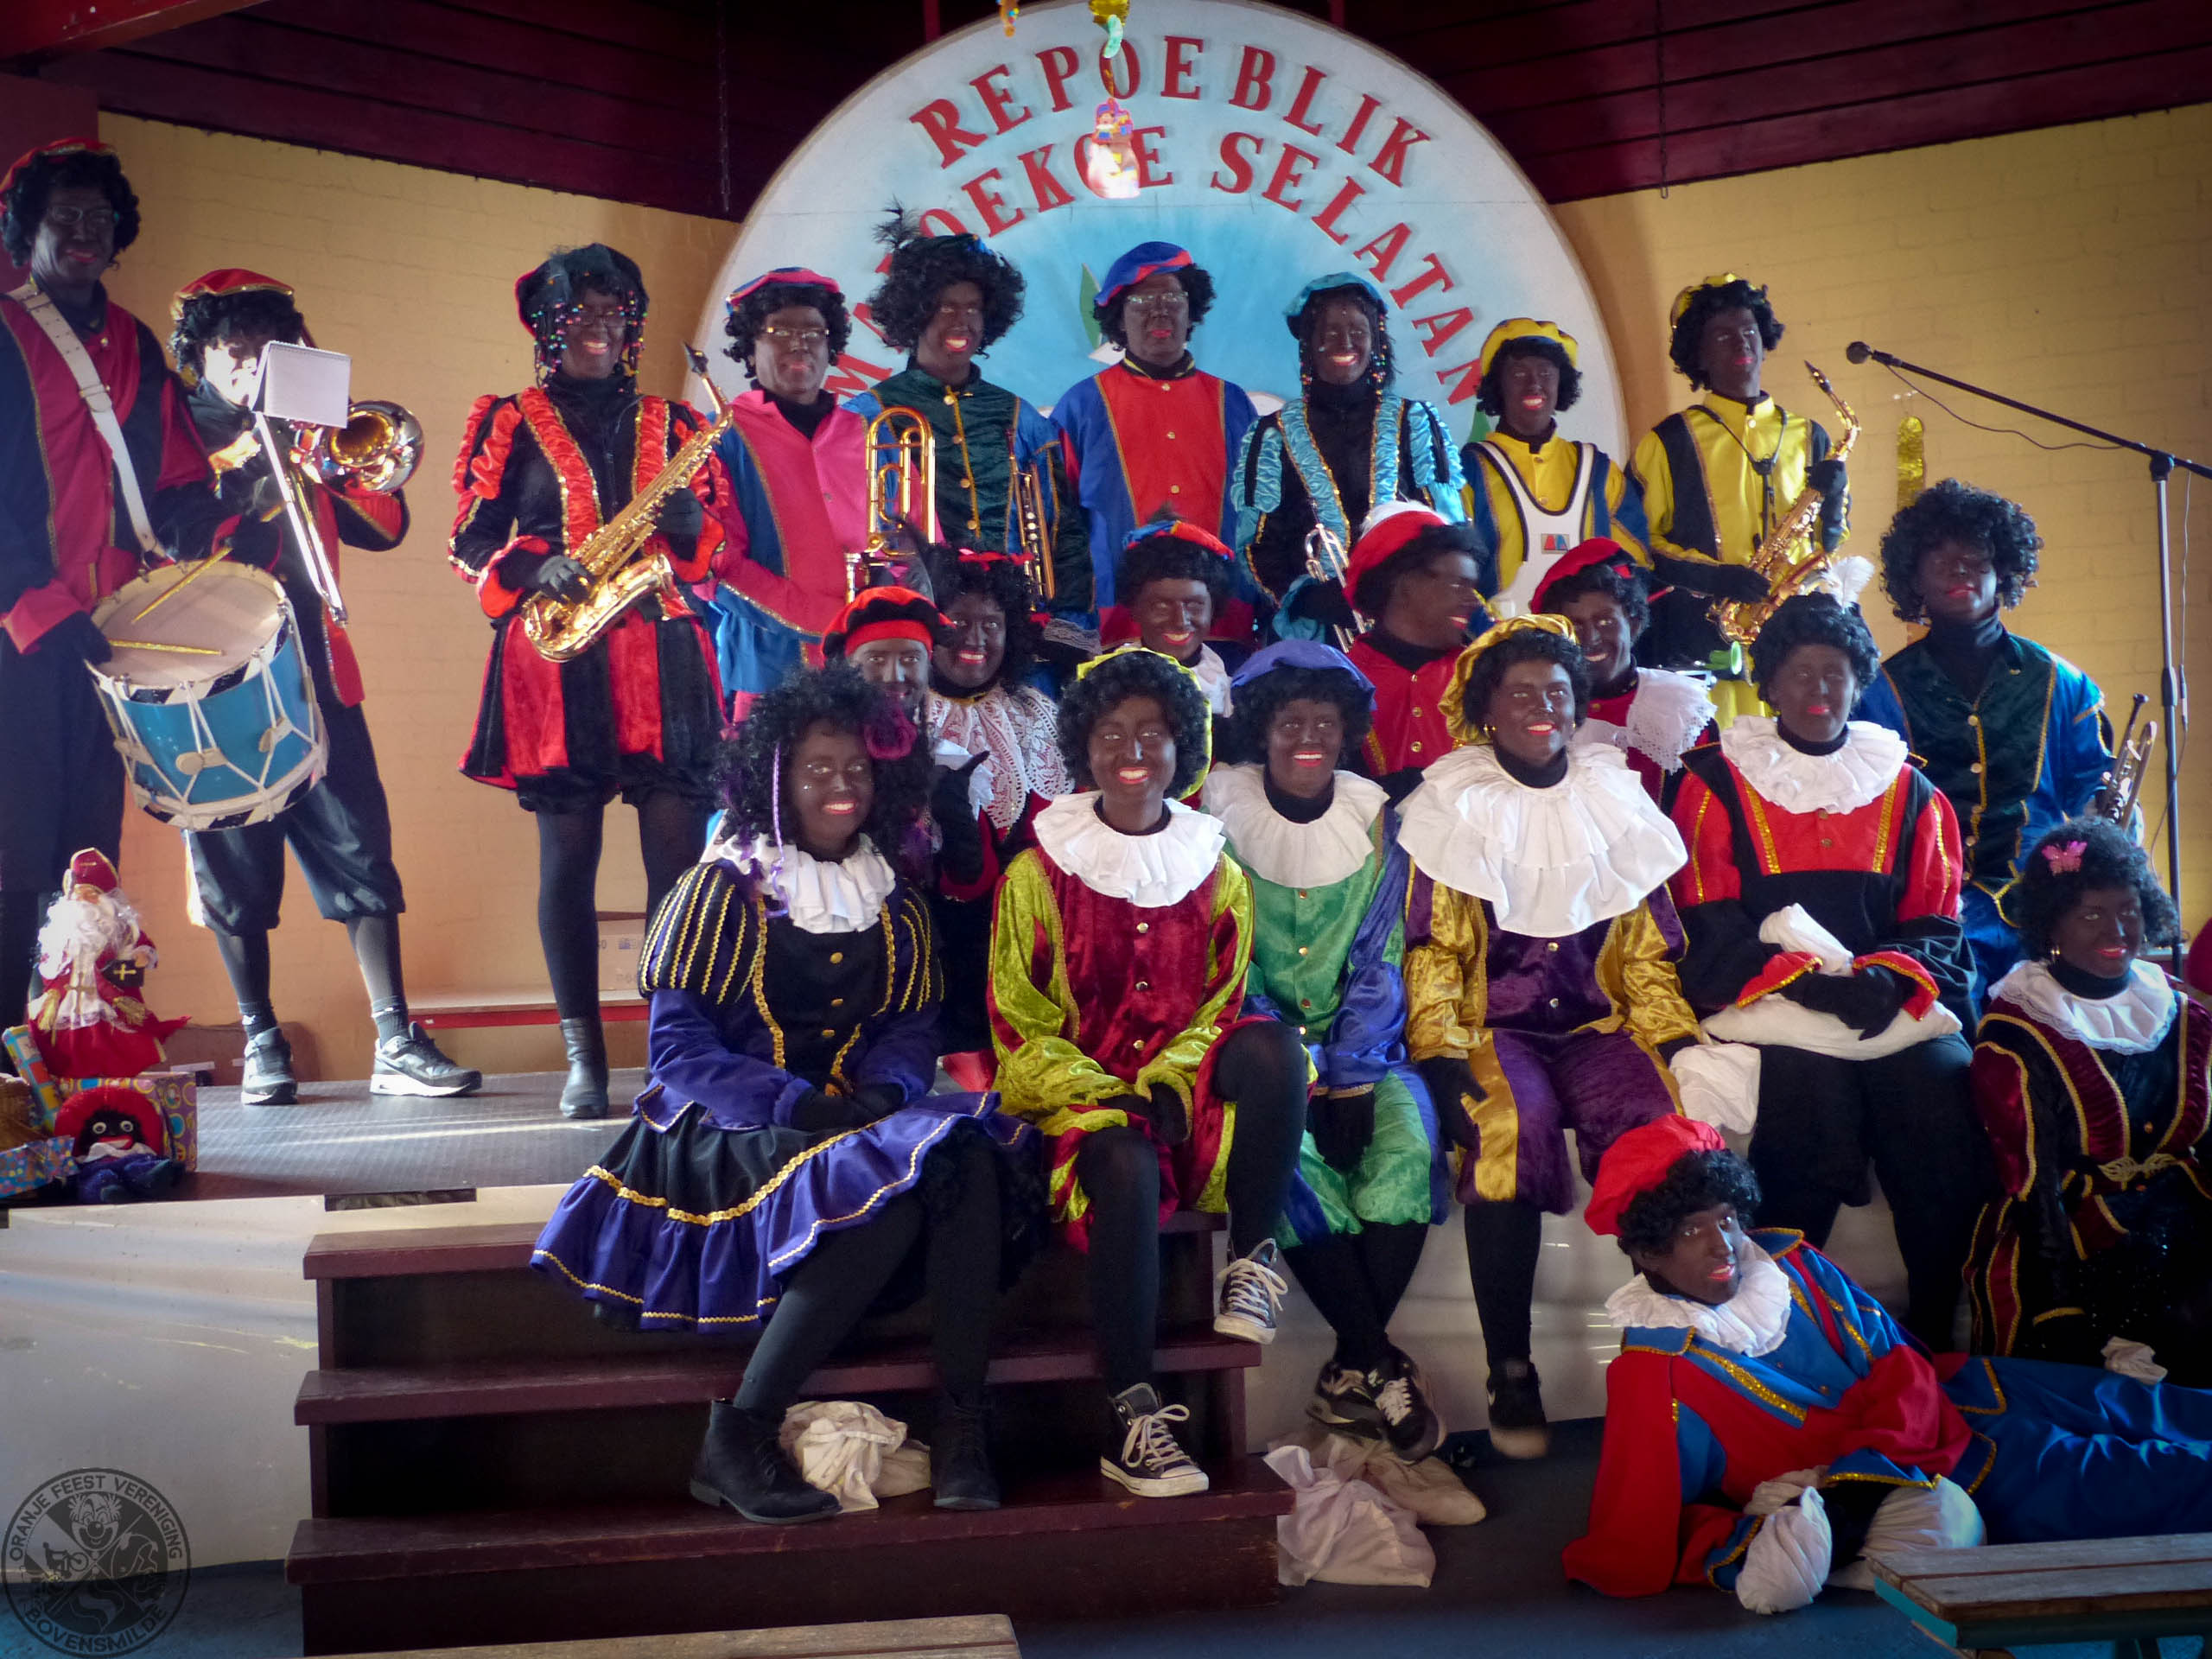 Sinterklaas Intocht 2016 Oranje Feest Vereniging Bovensmilde